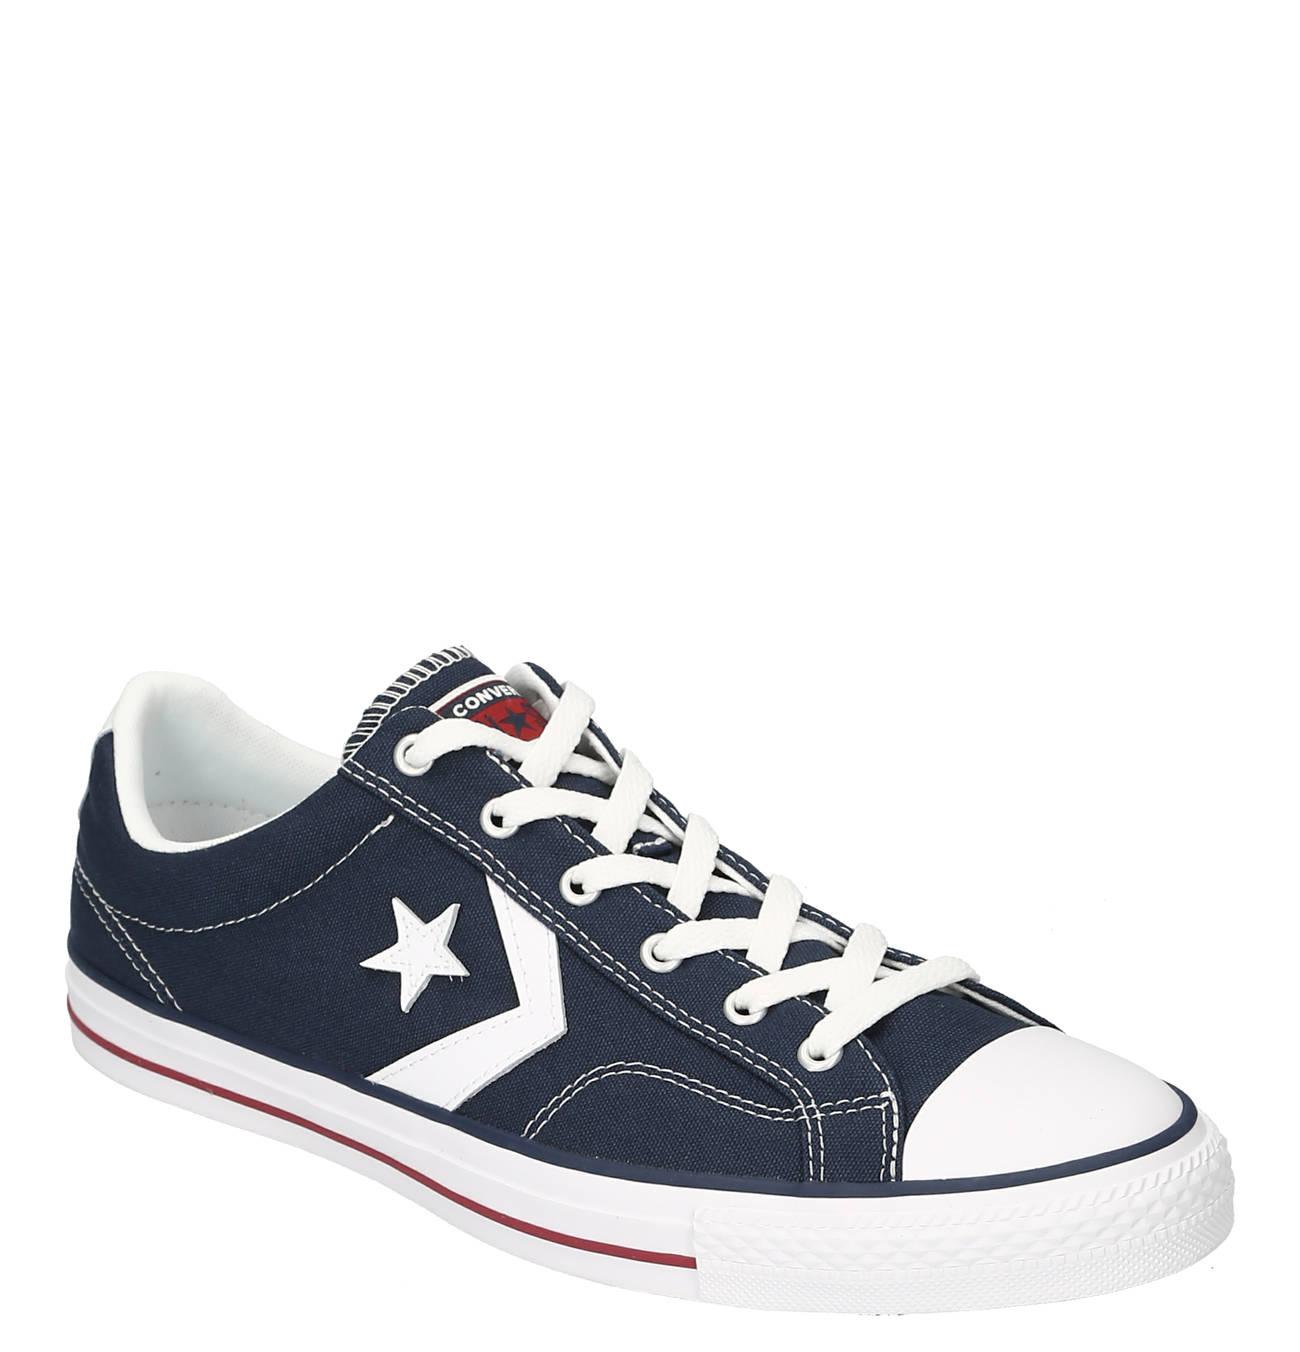 Sneaker, Marken Design, Stern Patches | Turnschuhe